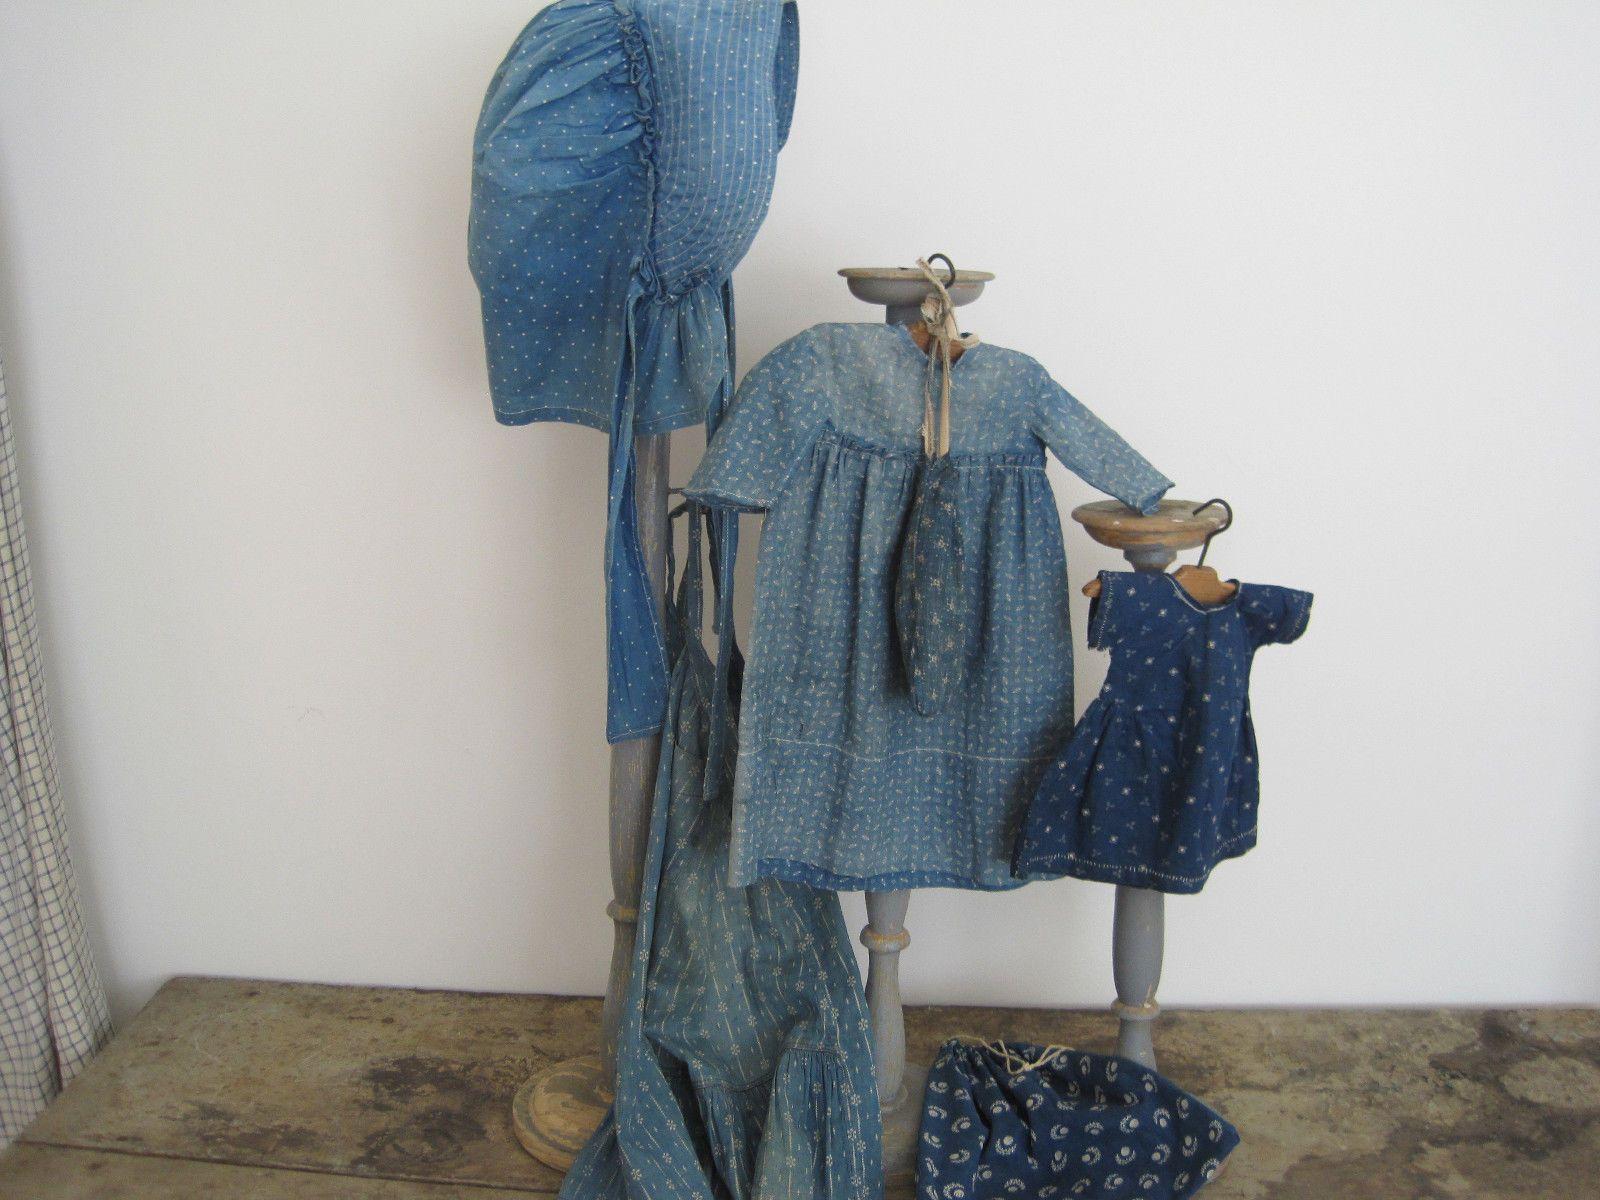 shop2loveit * ebay. Primitive clothing, Antique clothing